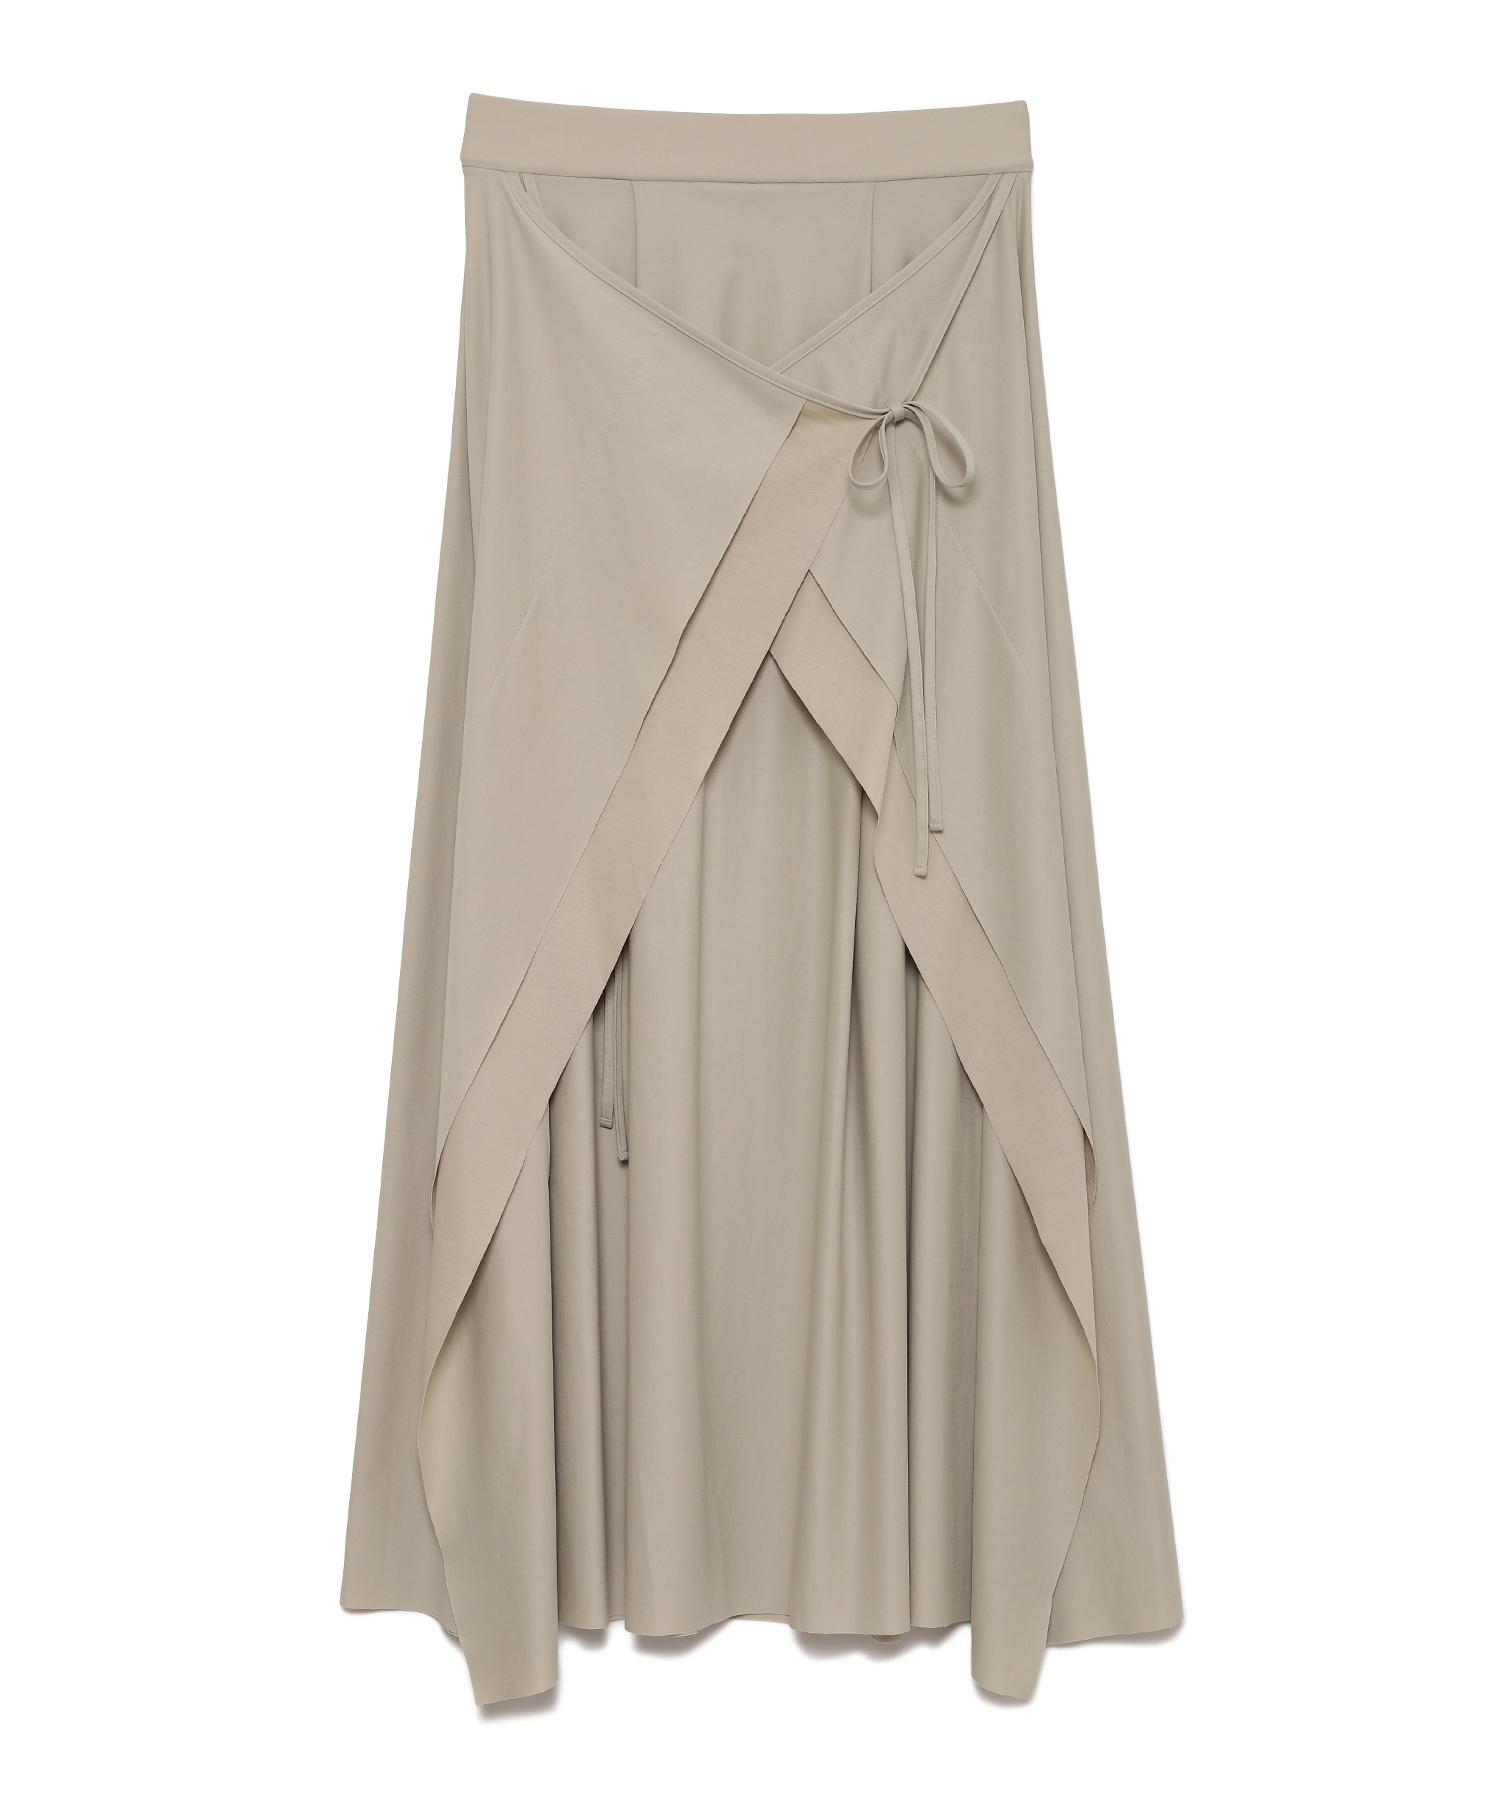 Seagreen CUT OFF CUT SEW skirt